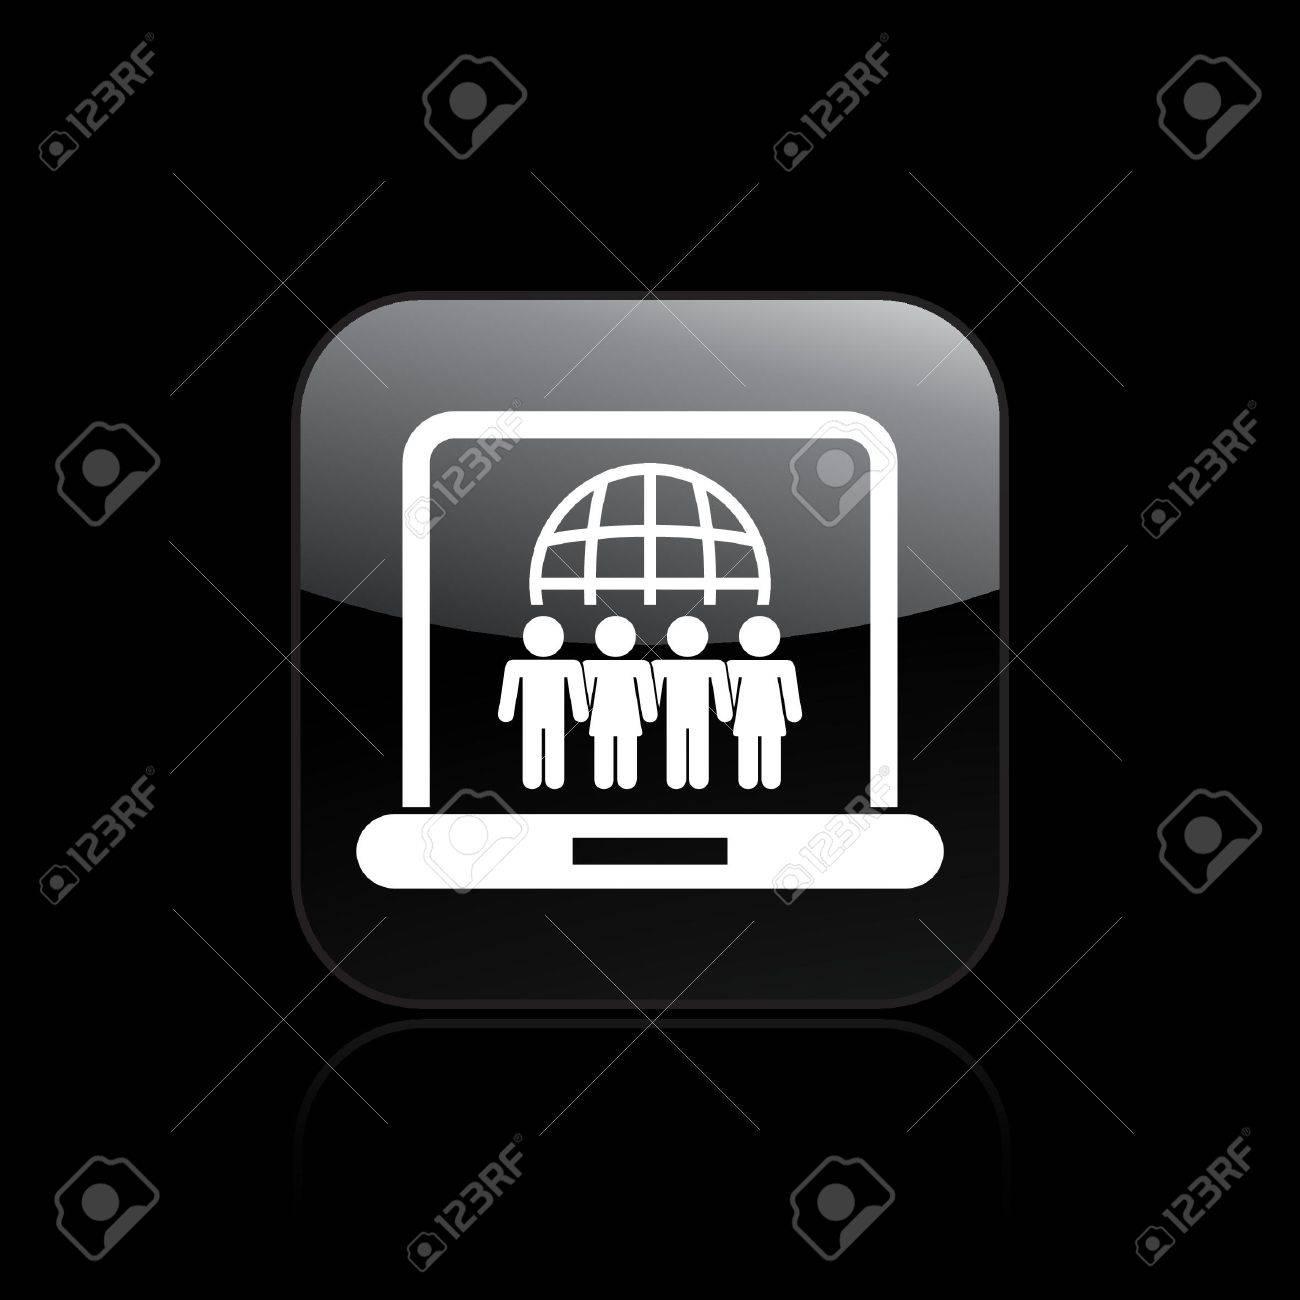 Vector illustration of web social union icon Stock Vector - 12119883